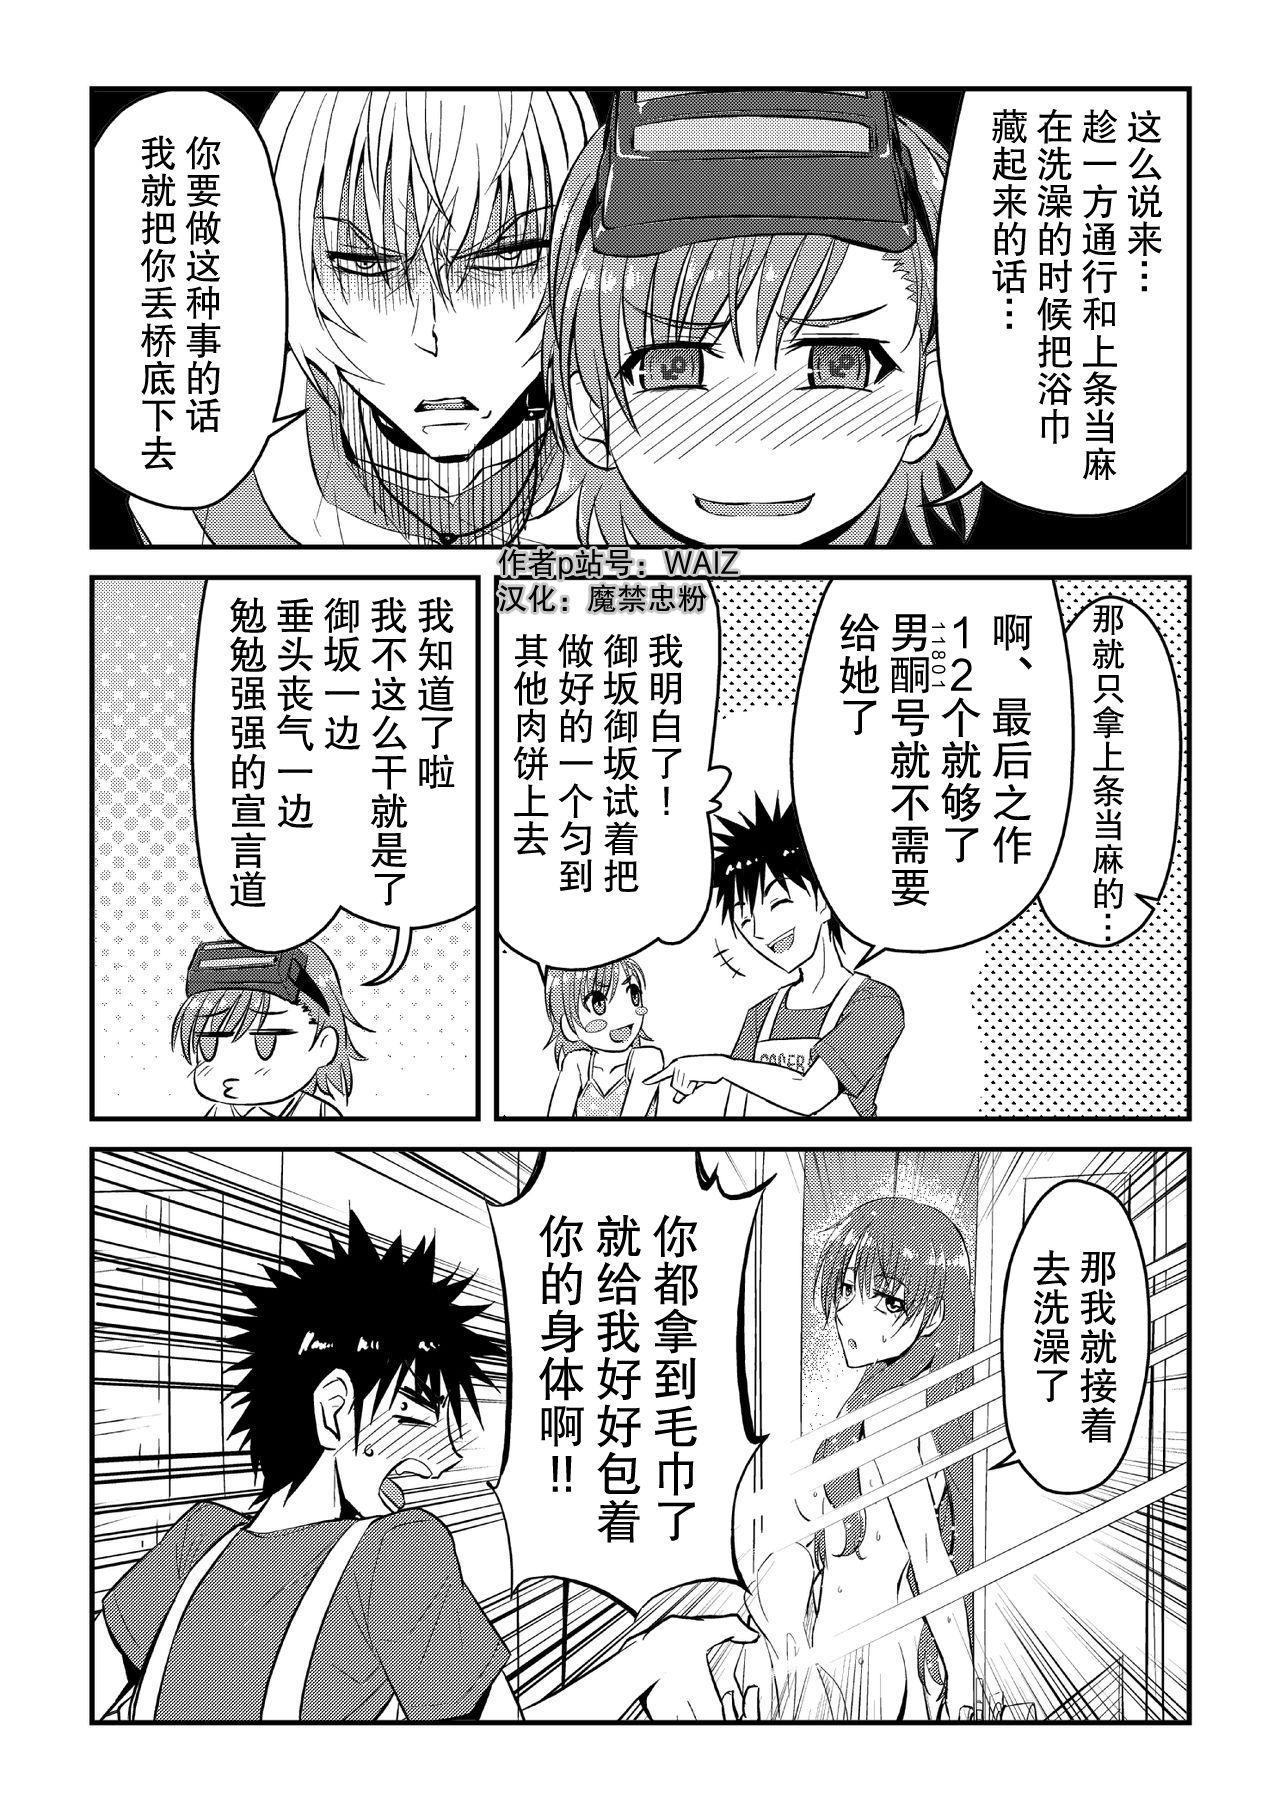 [WAIZ][同人个人渣汉化][就算是上条先生我家要住7个人还是太勉强了](Toaru Majutsu no Index) [中国翻译] 11